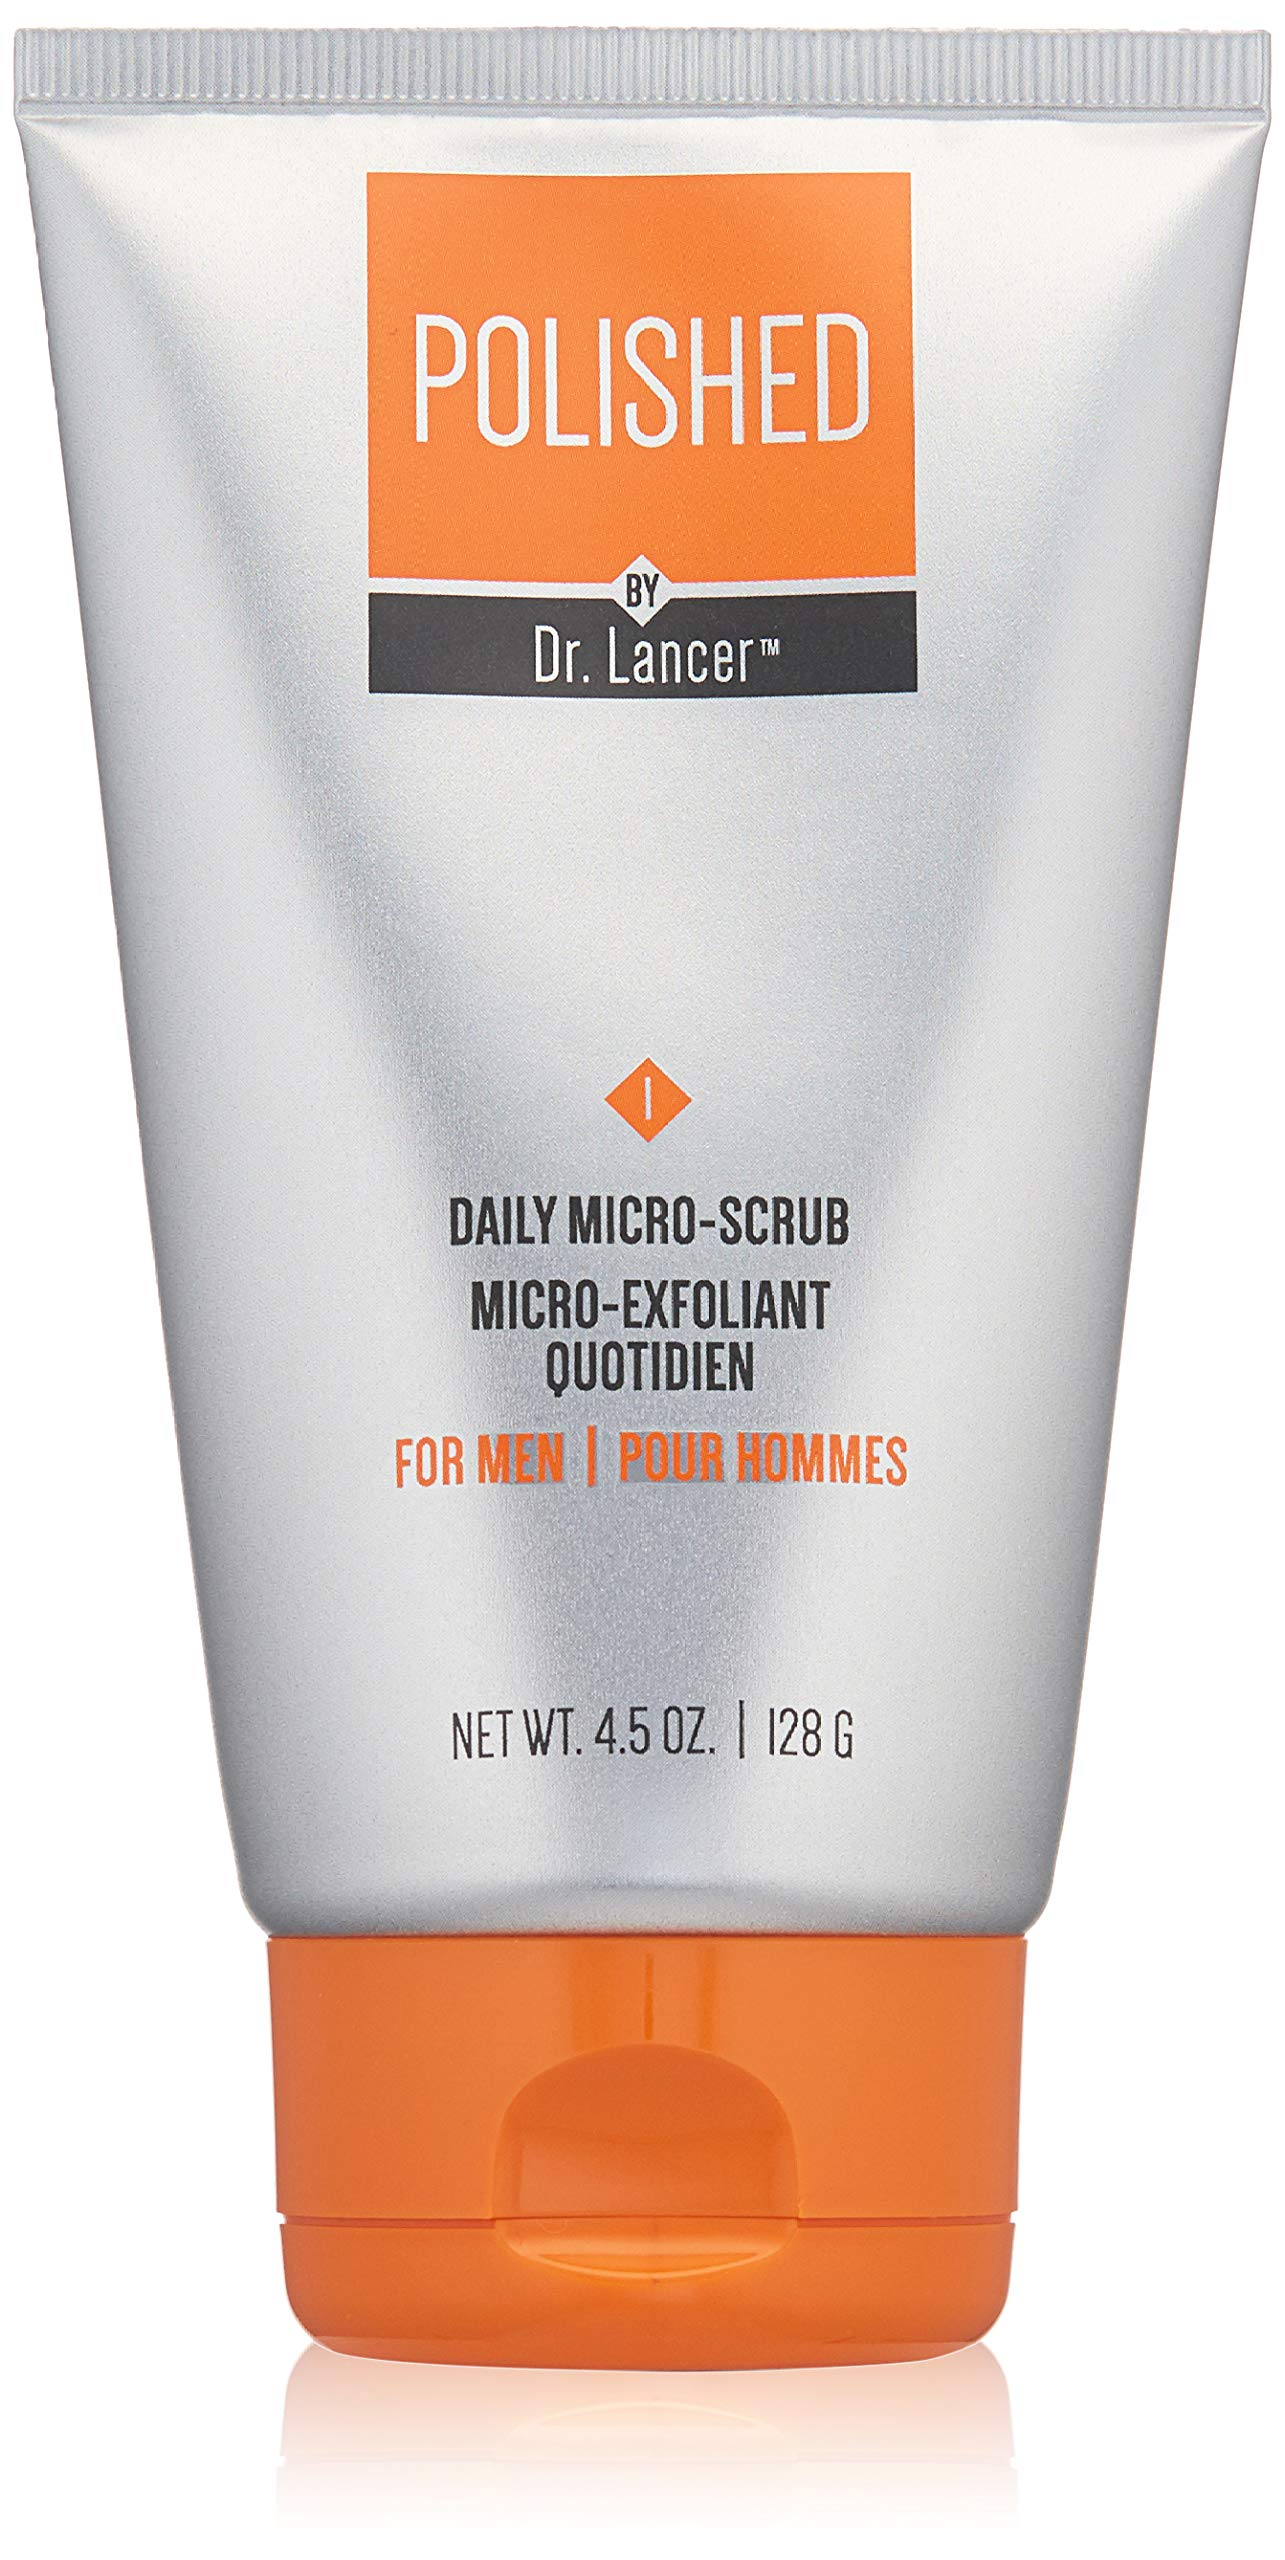 Polished by Dr. Lancer Daily Micro-Scrub, Men's Face Scrub, 4.5 Oz